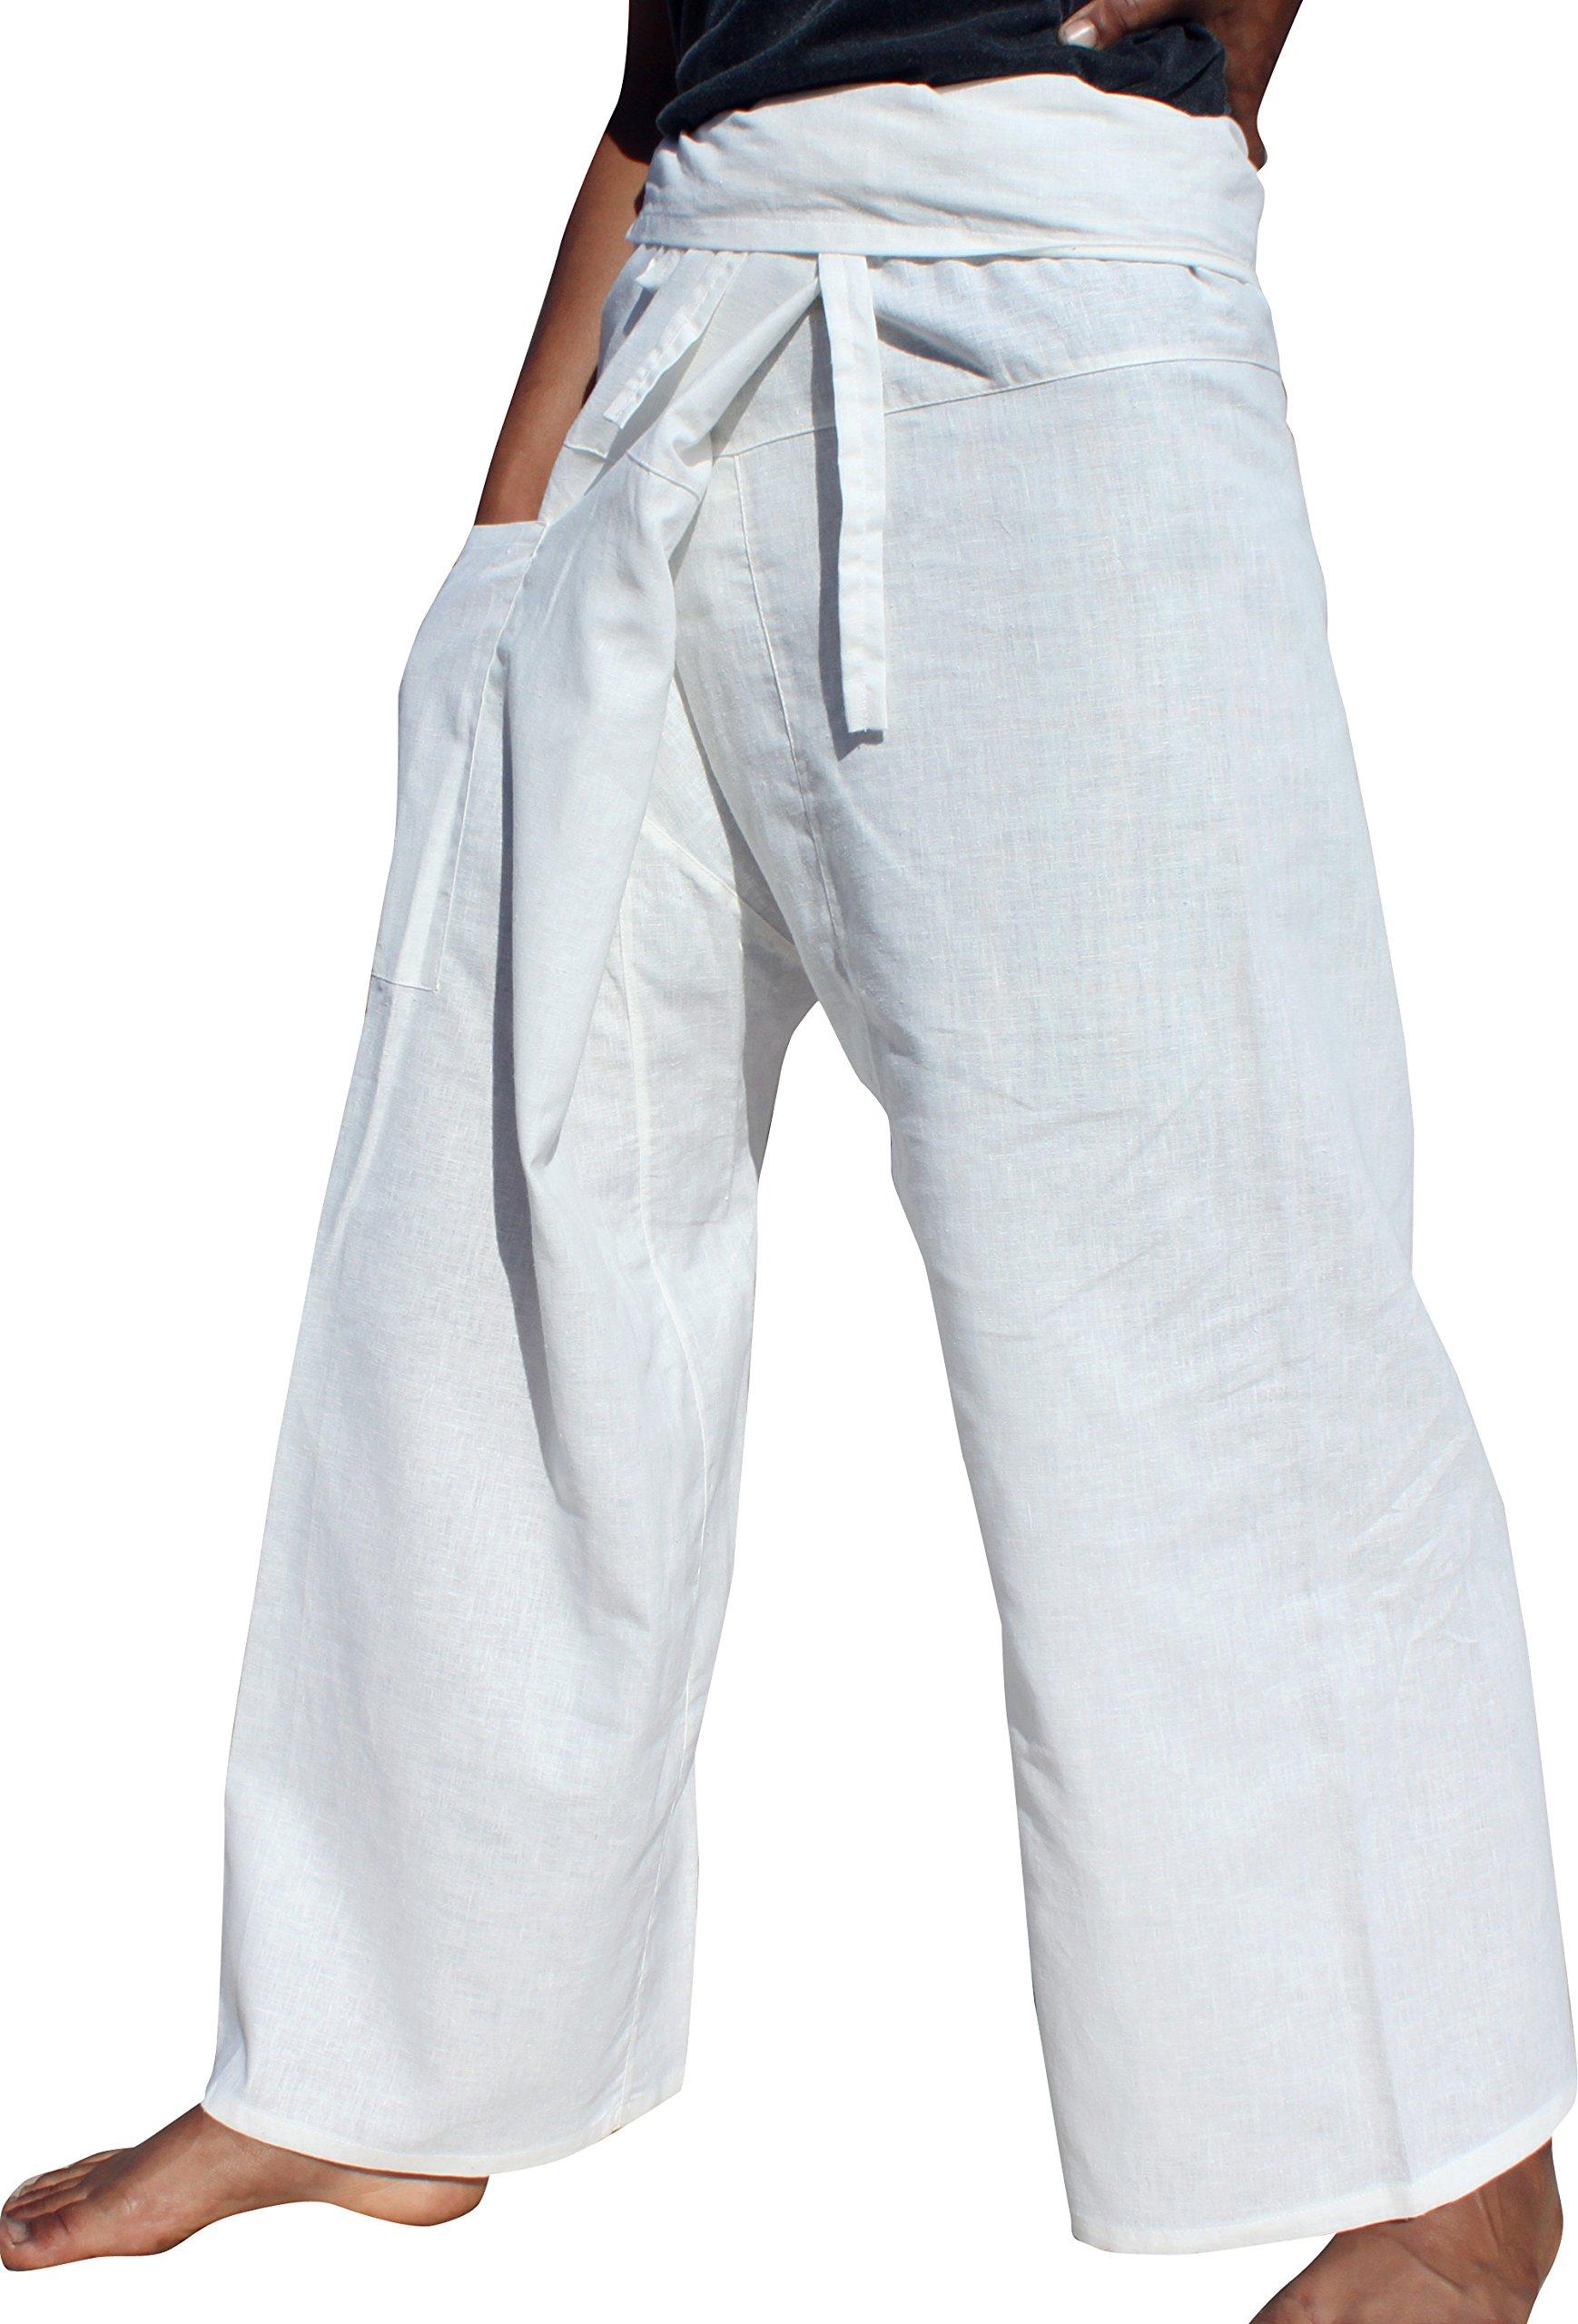 Raan Pah Muang High Grade Chinese 55% Hemp 45% Cotton Thai Fisherman Wrap Pants, Medium, White by Raan Pah Muang